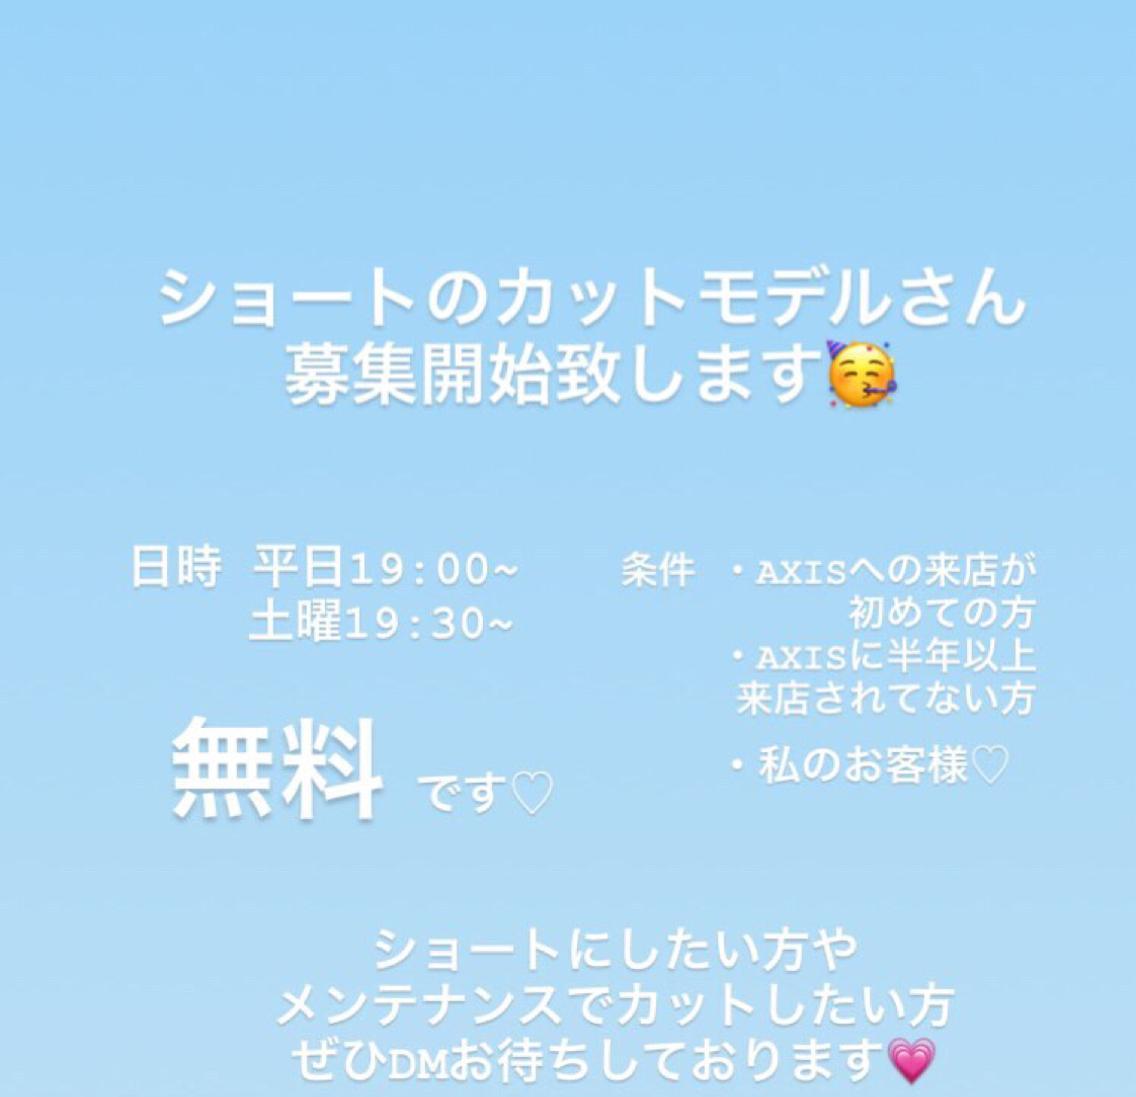 ❤'AXIS  8/26土曜日優先or平日ロングのカットモデル募集 ❤